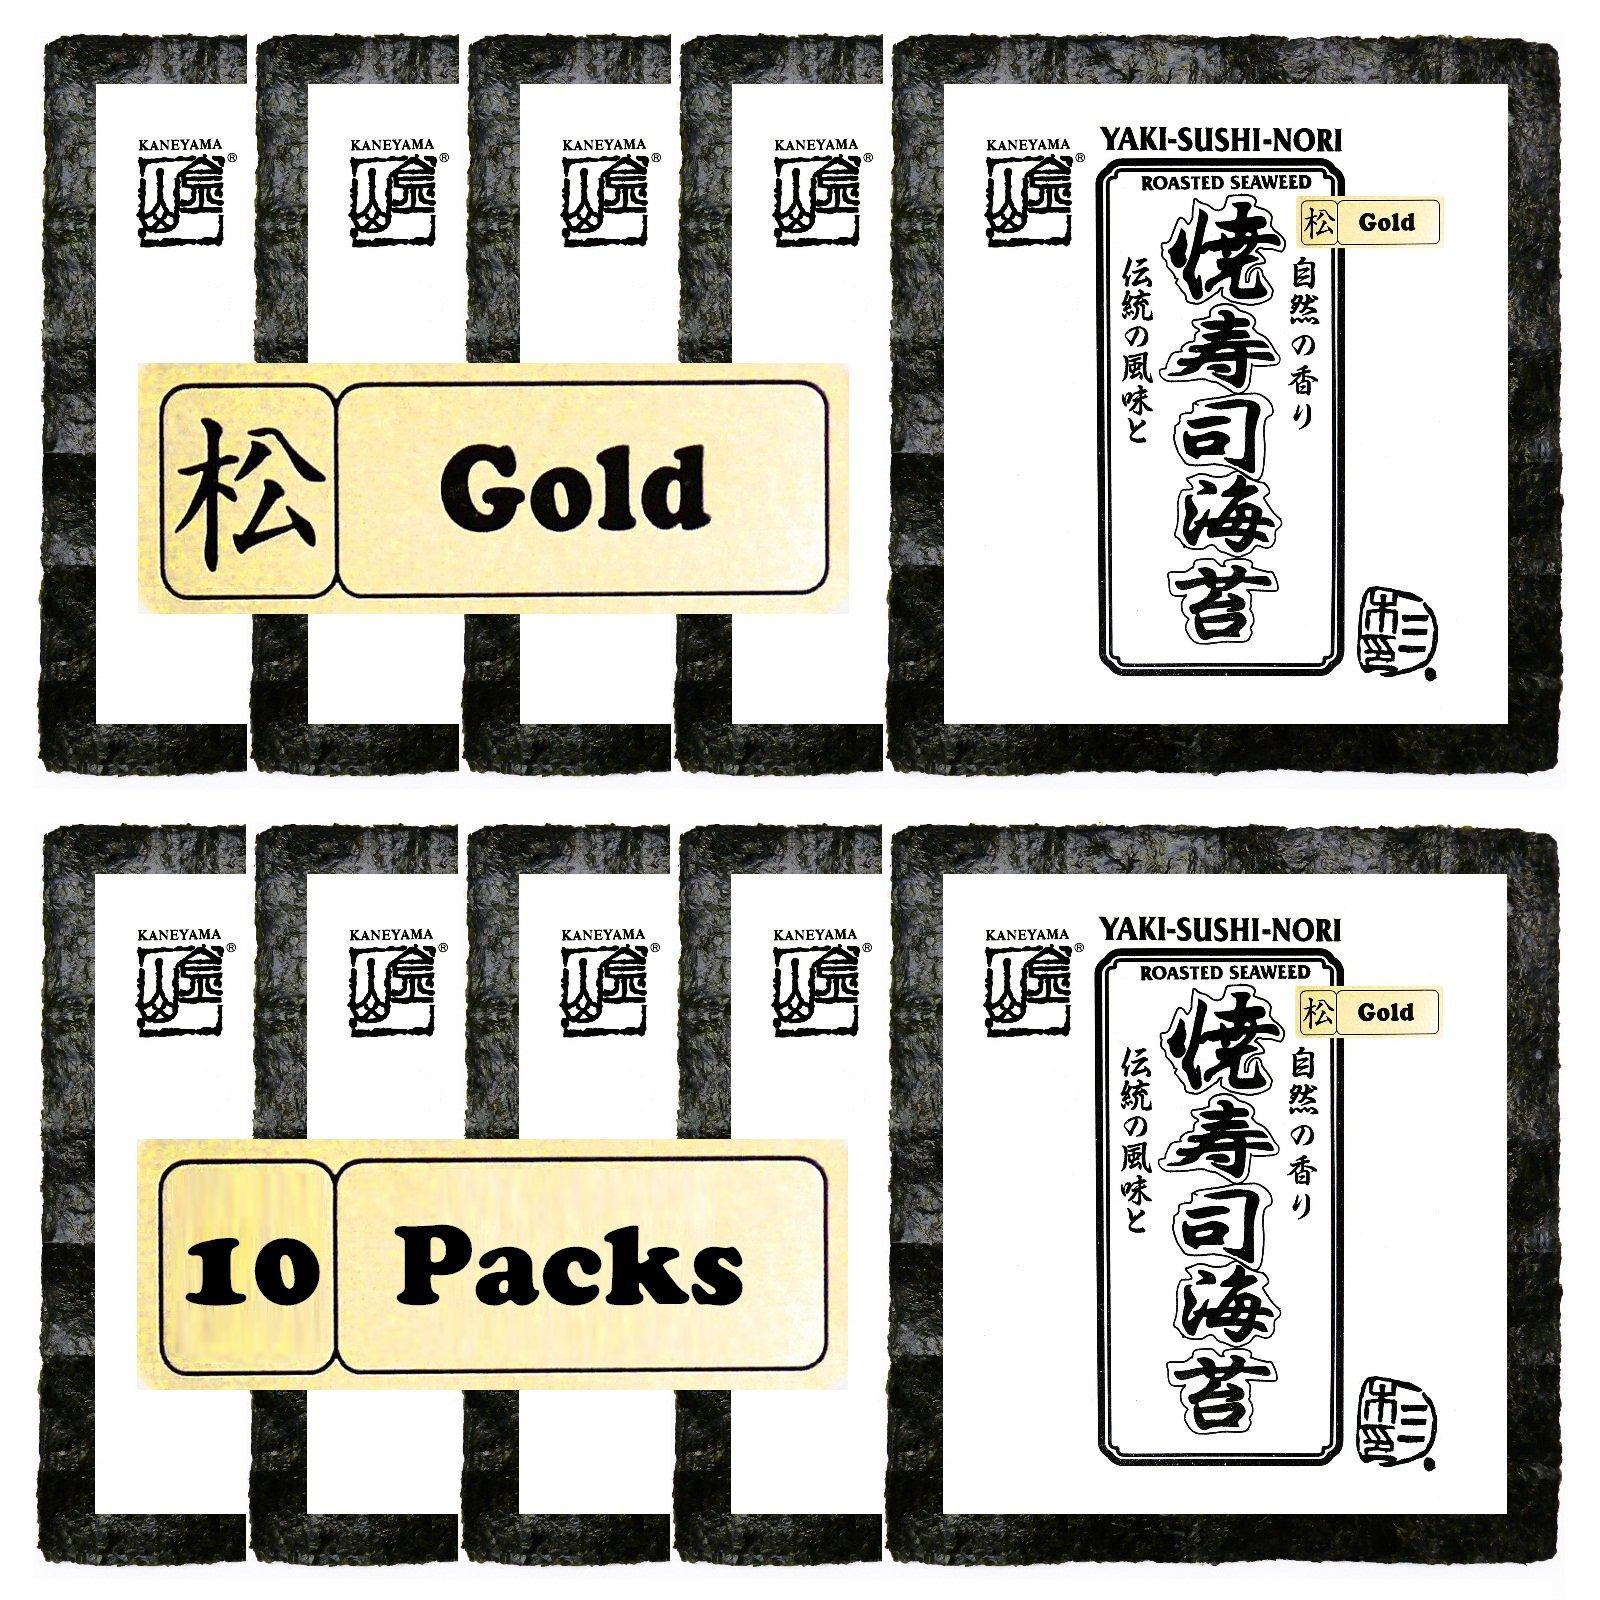 Kaneyama Yaki Sushi Nori / Dried Seaweed (Vacuum-packed/re-sealable), Gold Grade, Full Size, 10 Packs of 50 Sheets